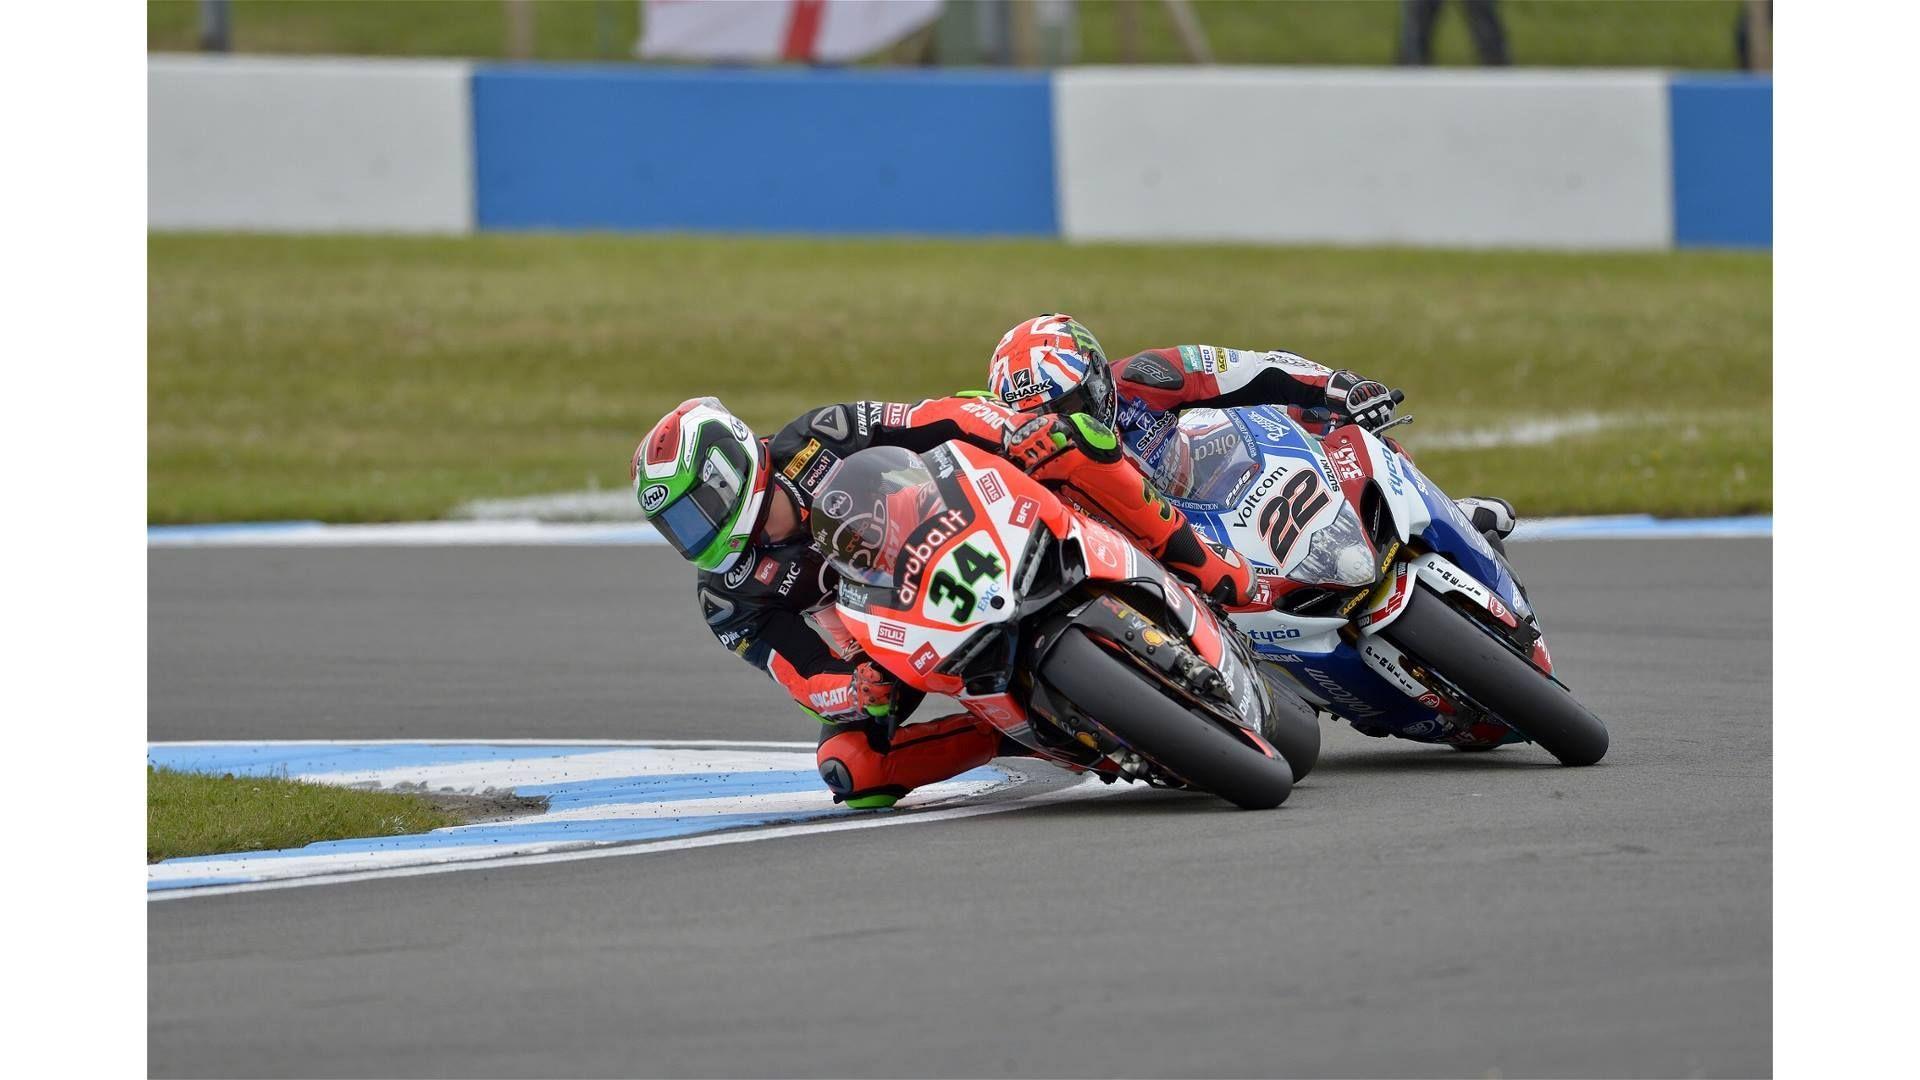 2015 Ducati Panigale R   2015 Aruba.it Racing-Ducati Superbike Season